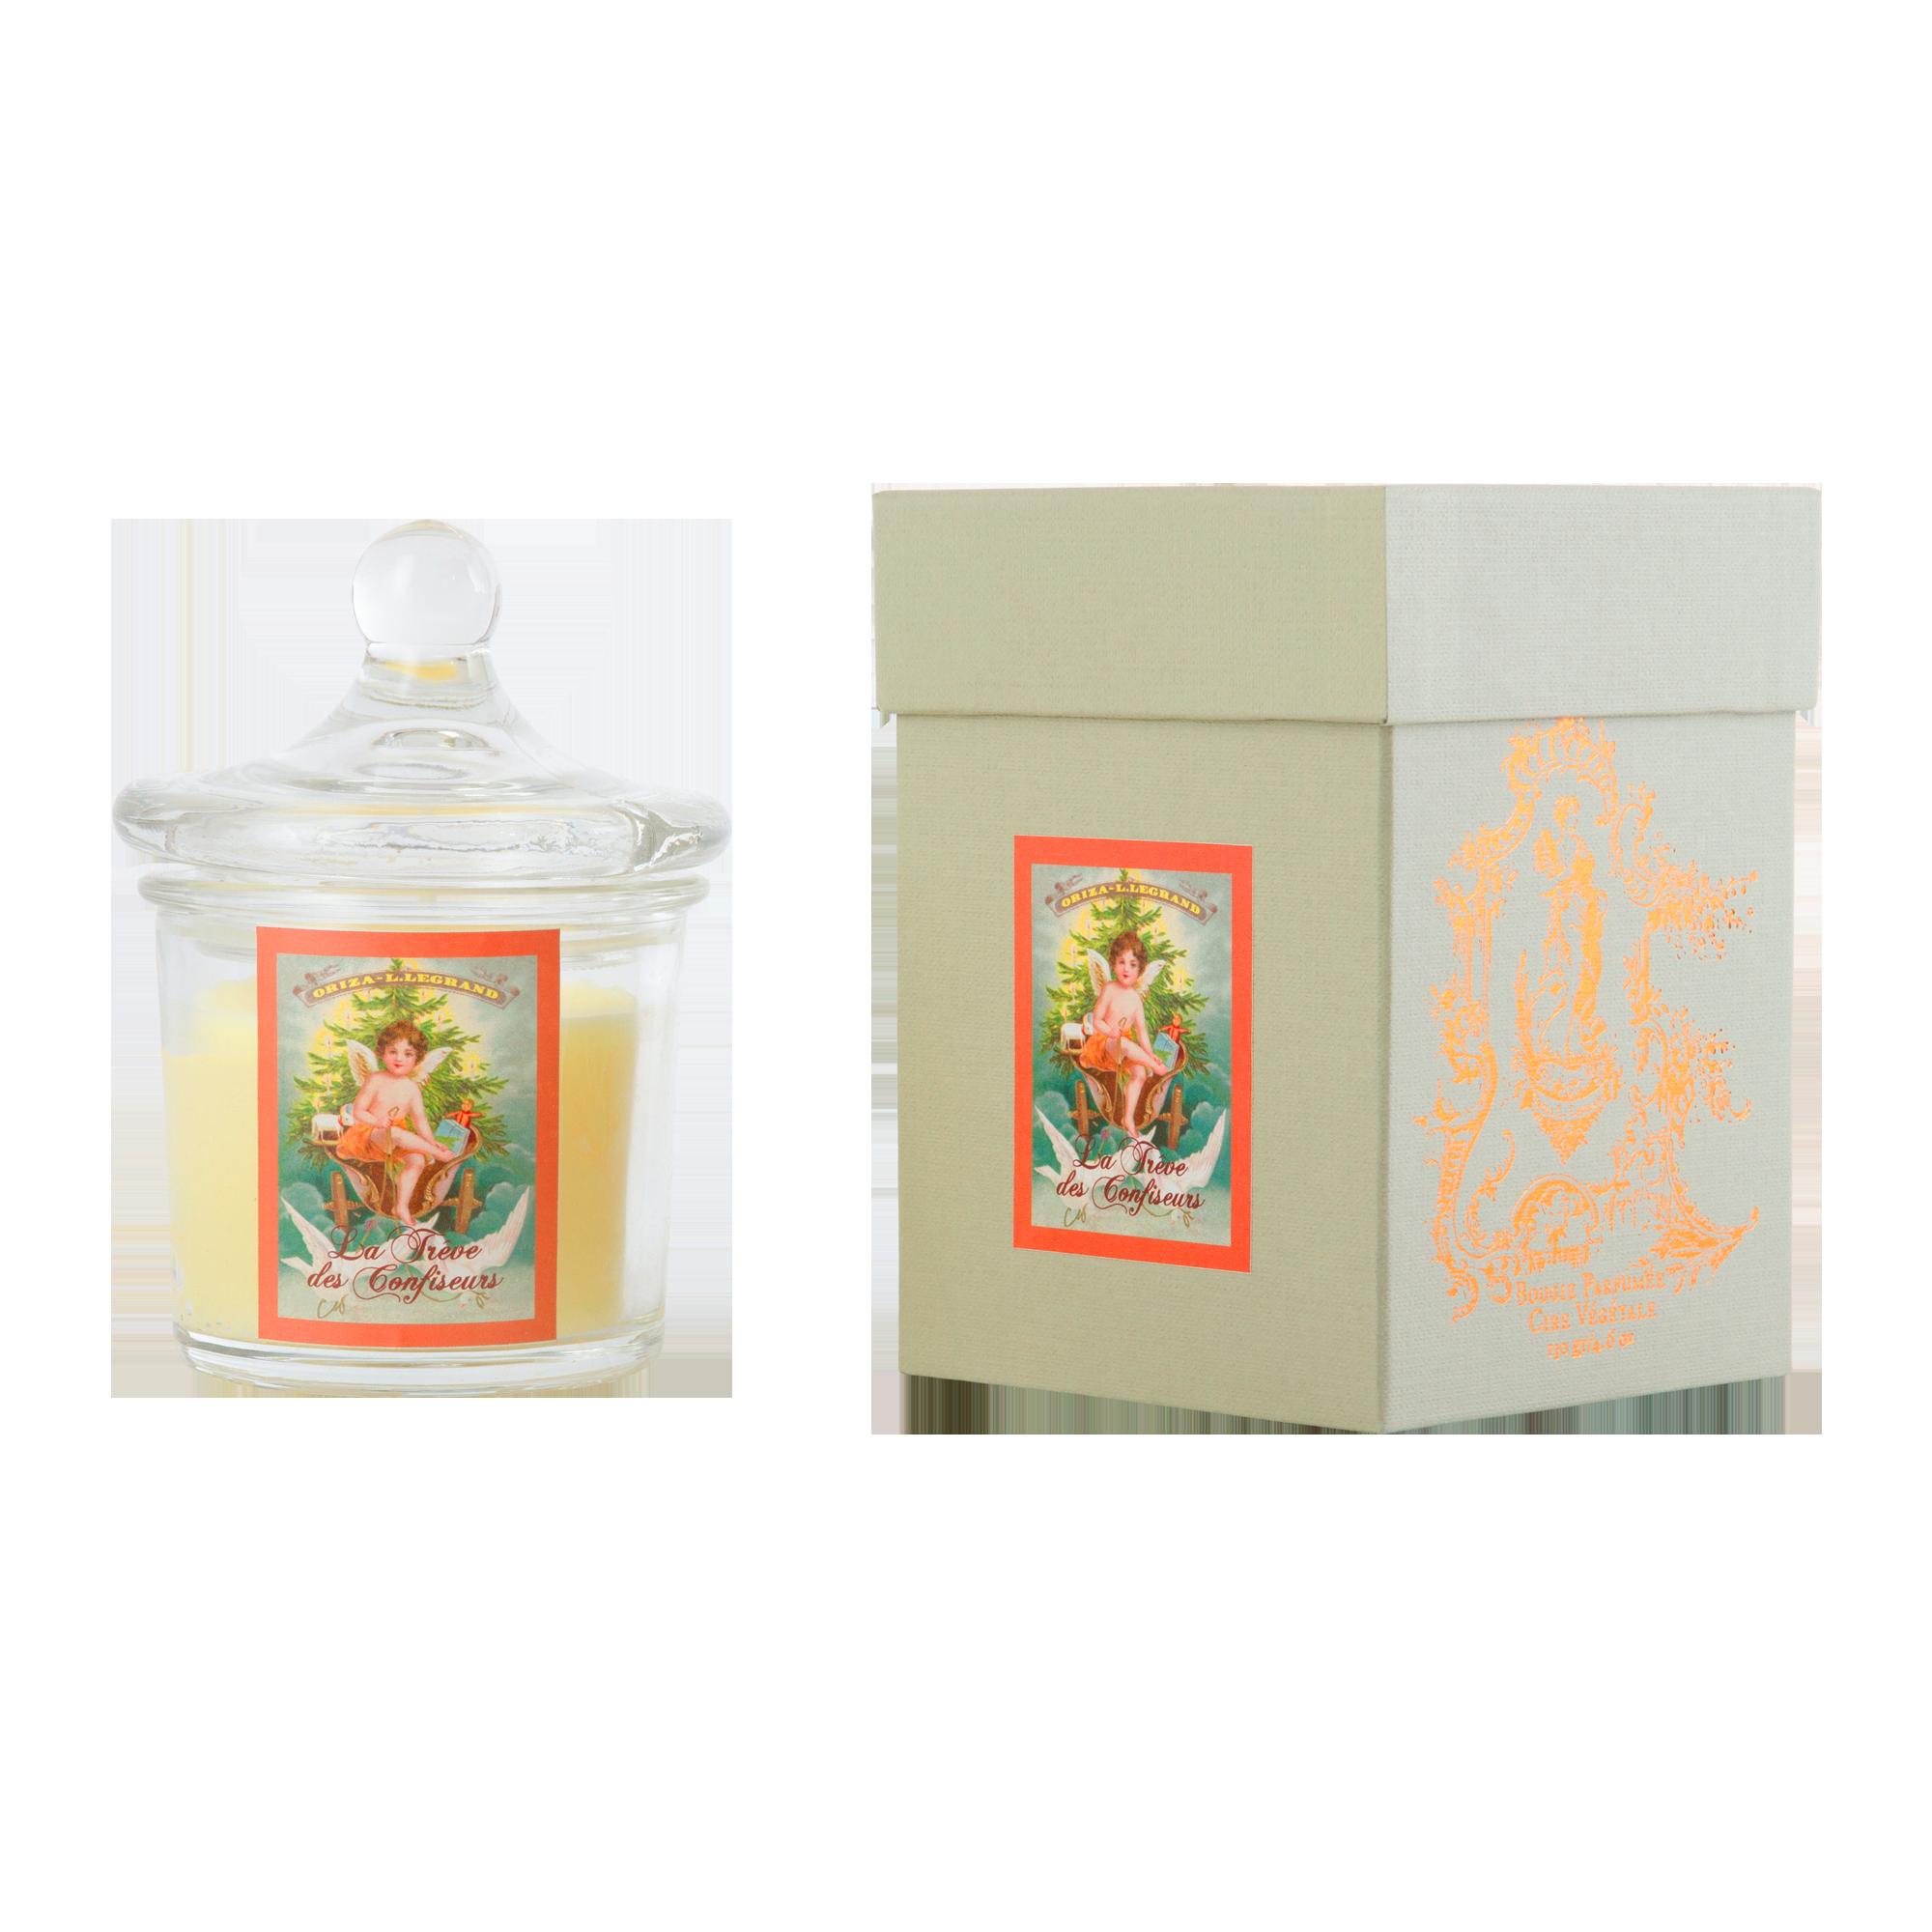 ORIZA L.LEGRAND La Trêve des Confiseurs Perfumed Candle 130 g